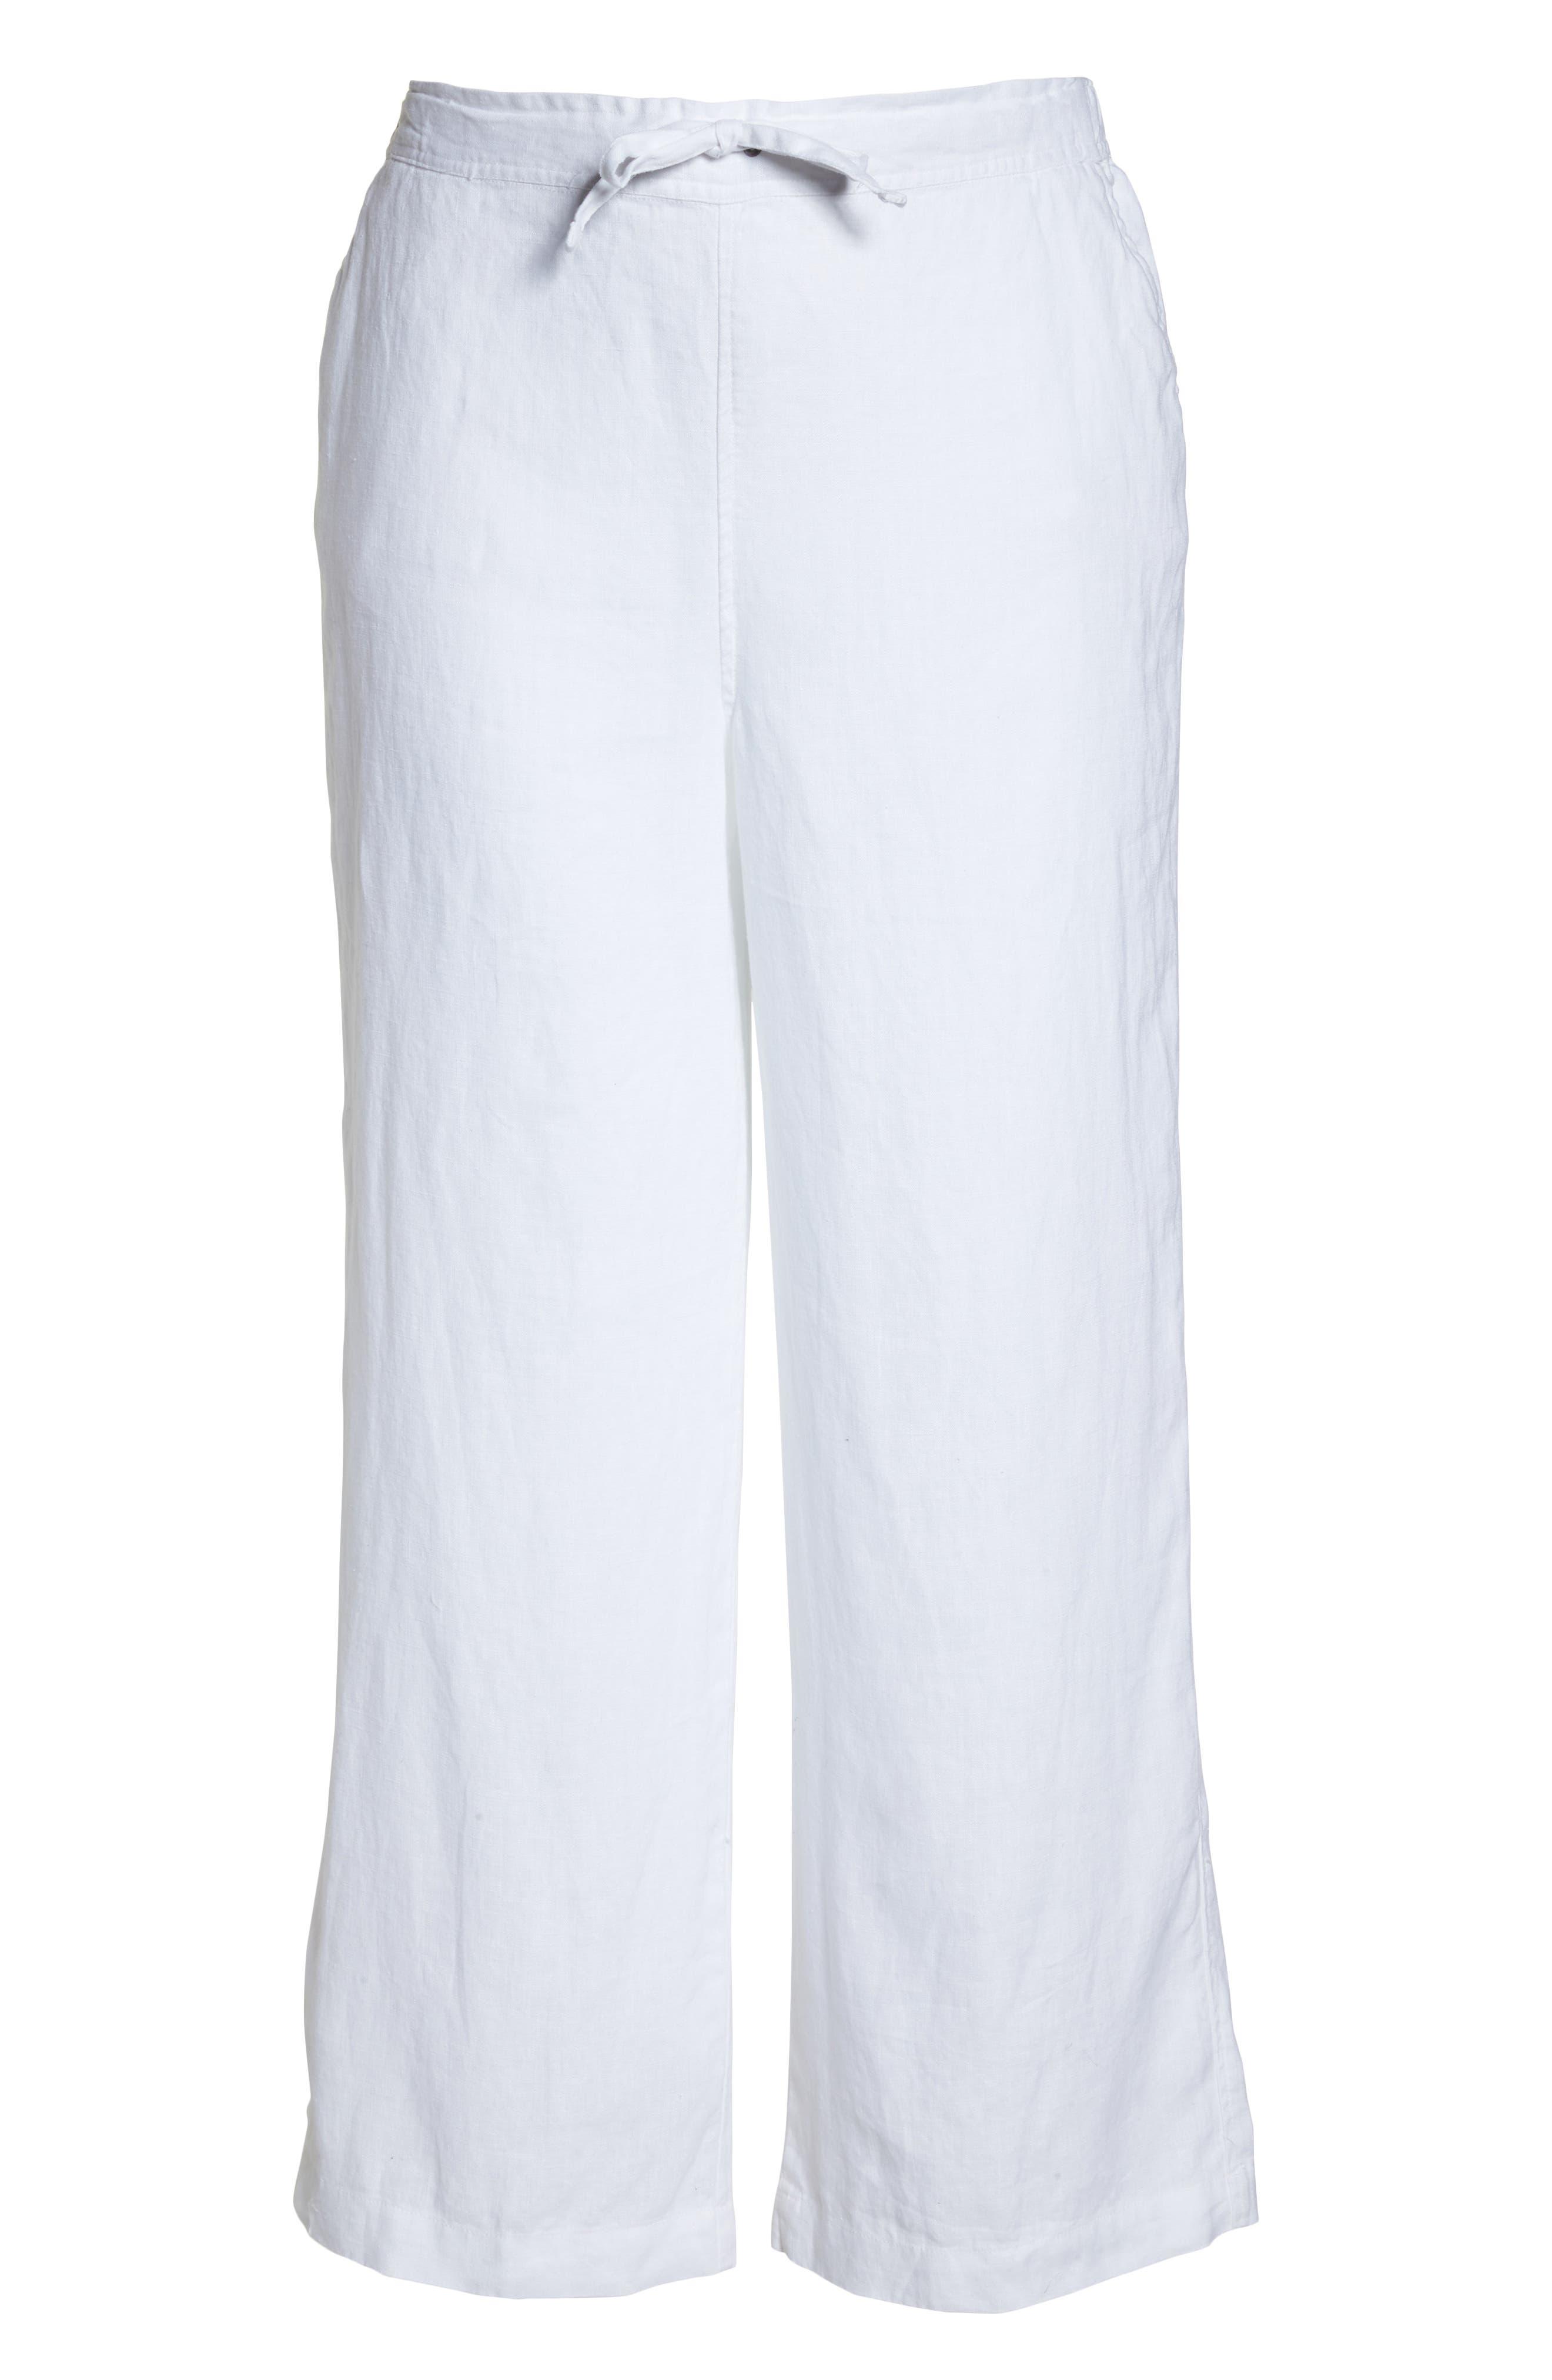 Wide Leg Linen Pants,                             Alternate thumbnail 7, color,                             ULTRA WHITE